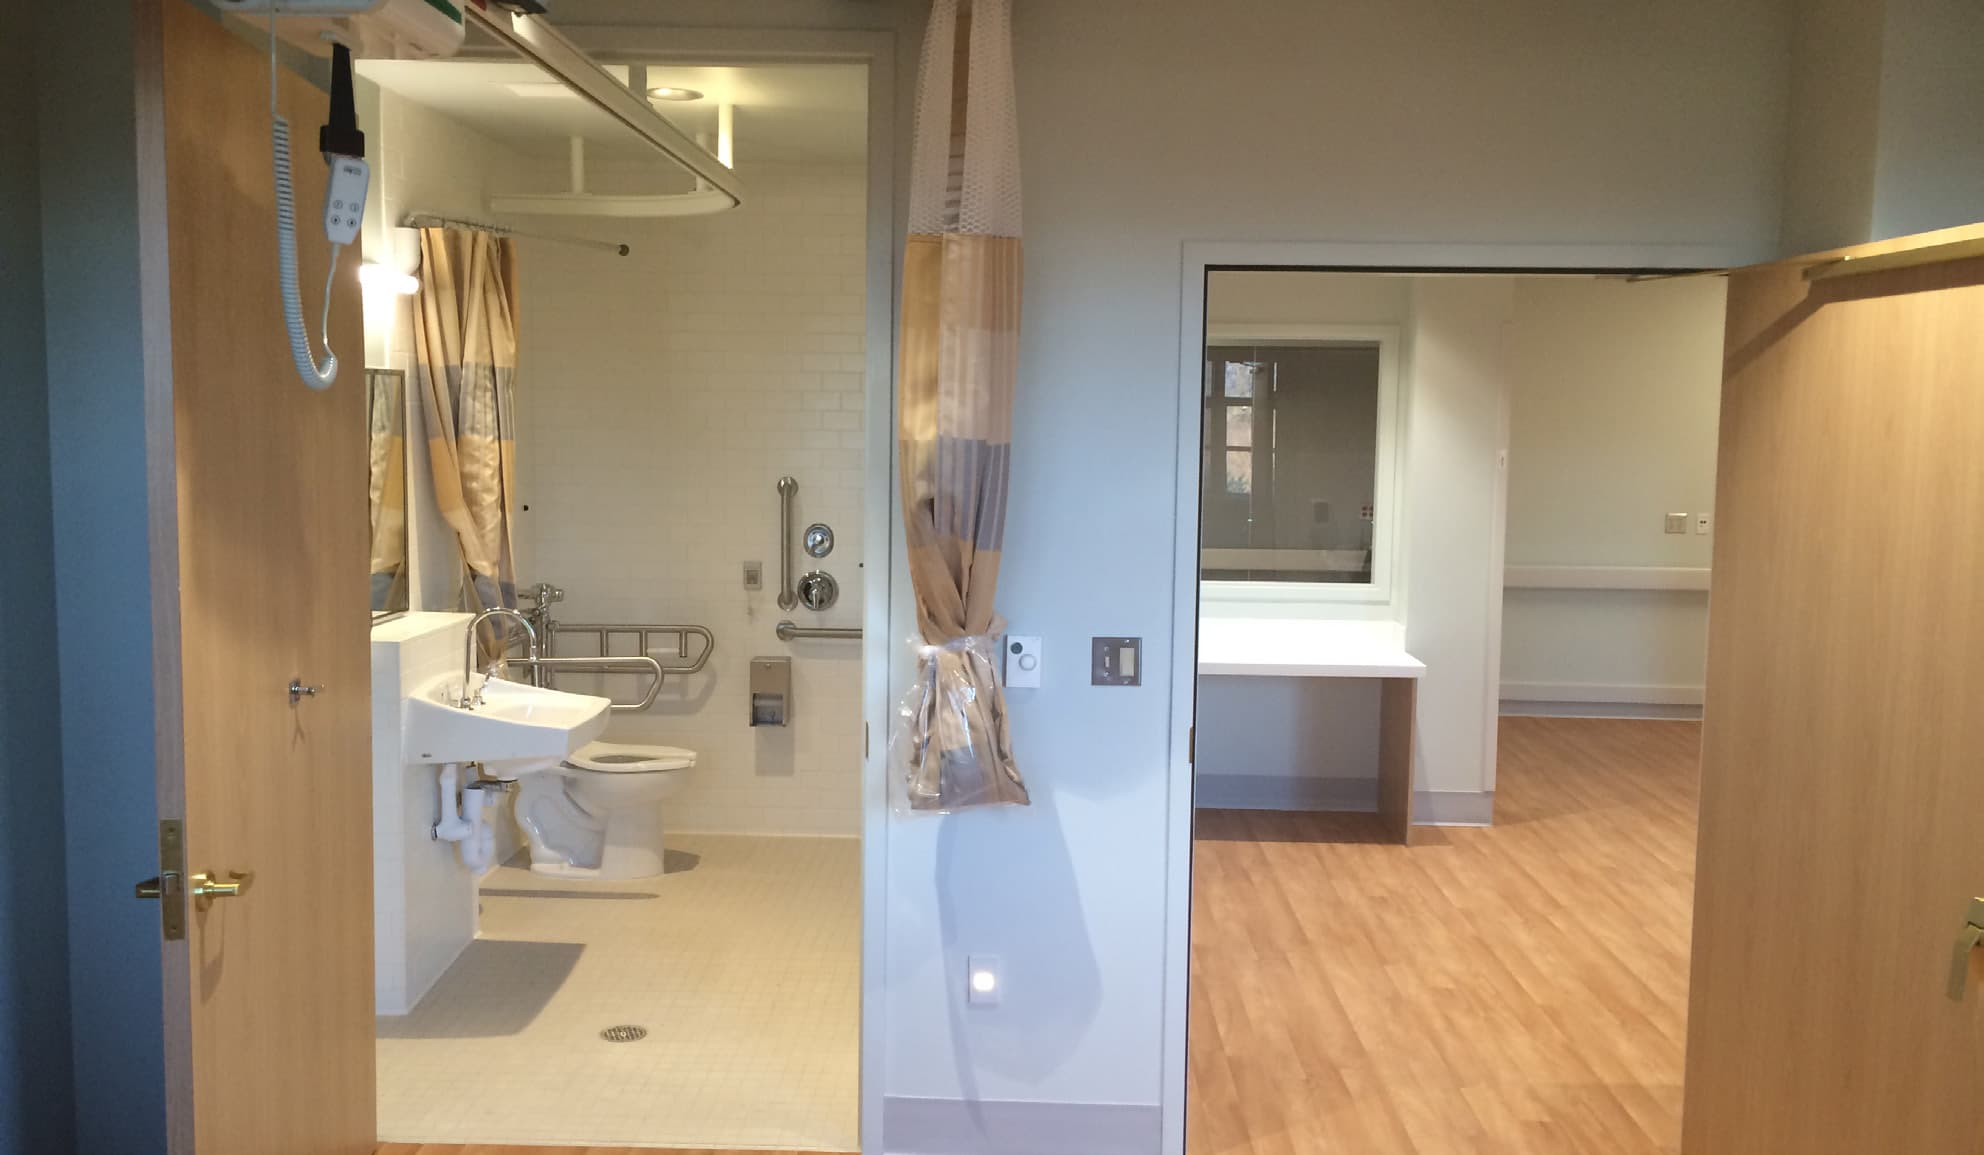 VERTEX Surety, Construction Management, Hospital ICU Renovation, Roseburg, OR 31695